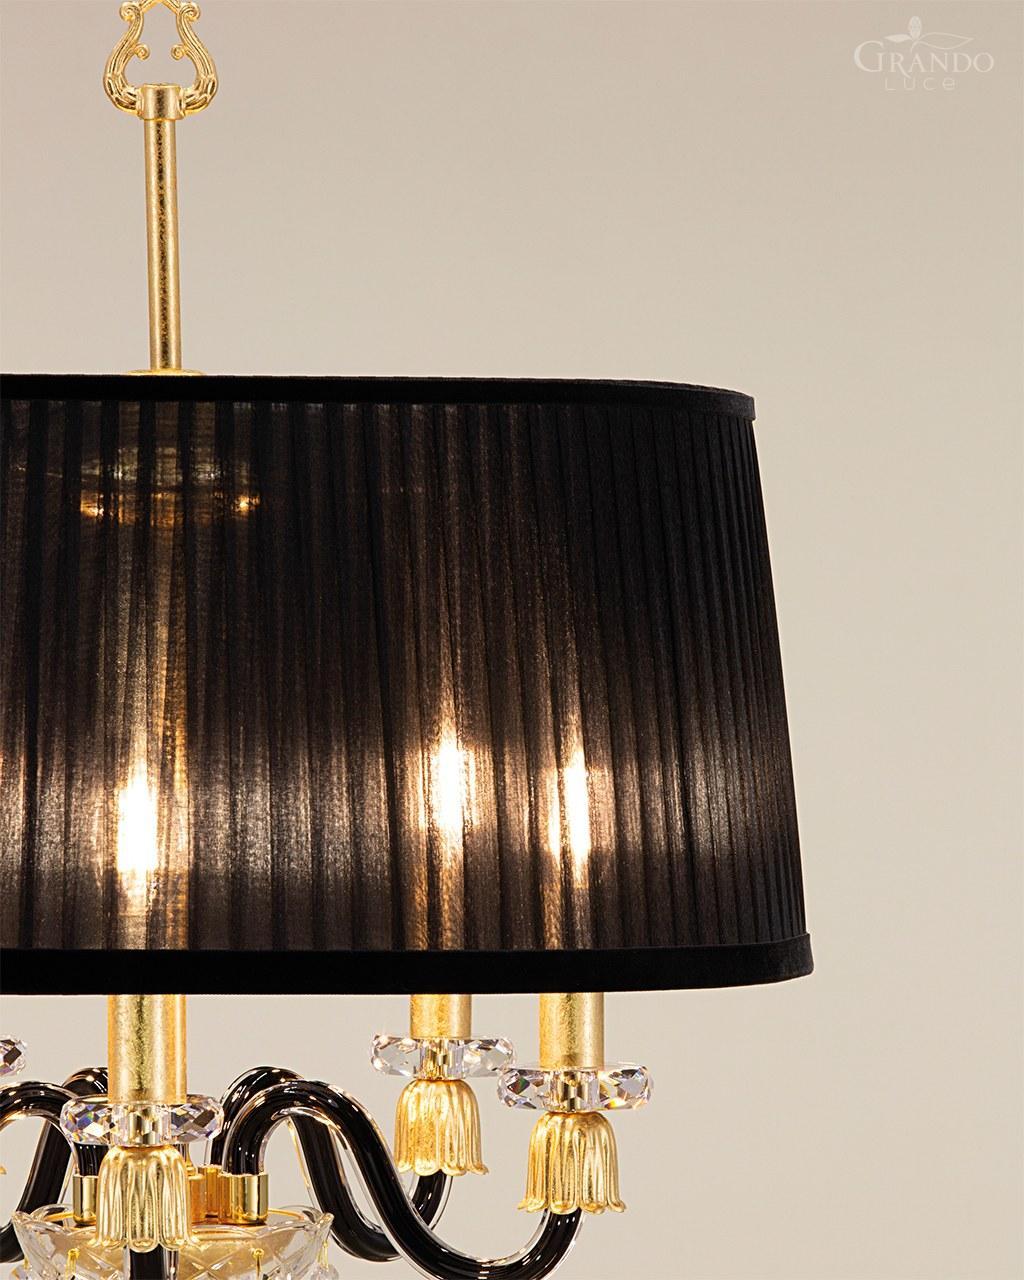 105 Fl 5 Gold Leaf Black Crystal Floor Lamp Organdy Black Shade Grandoluce